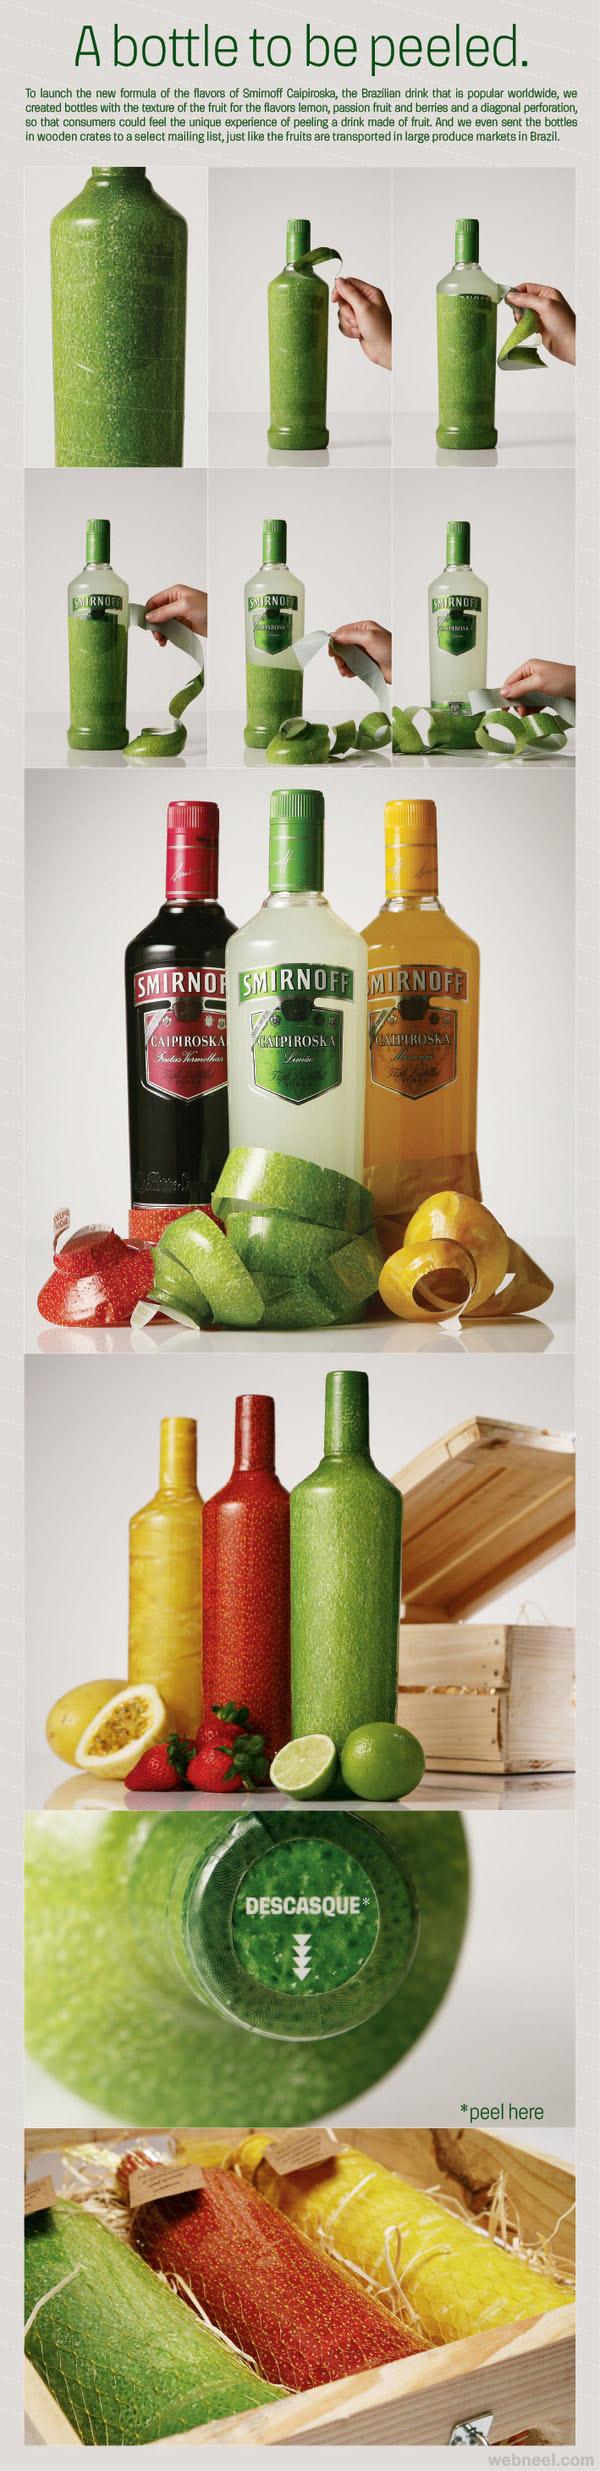 bottle packaging design